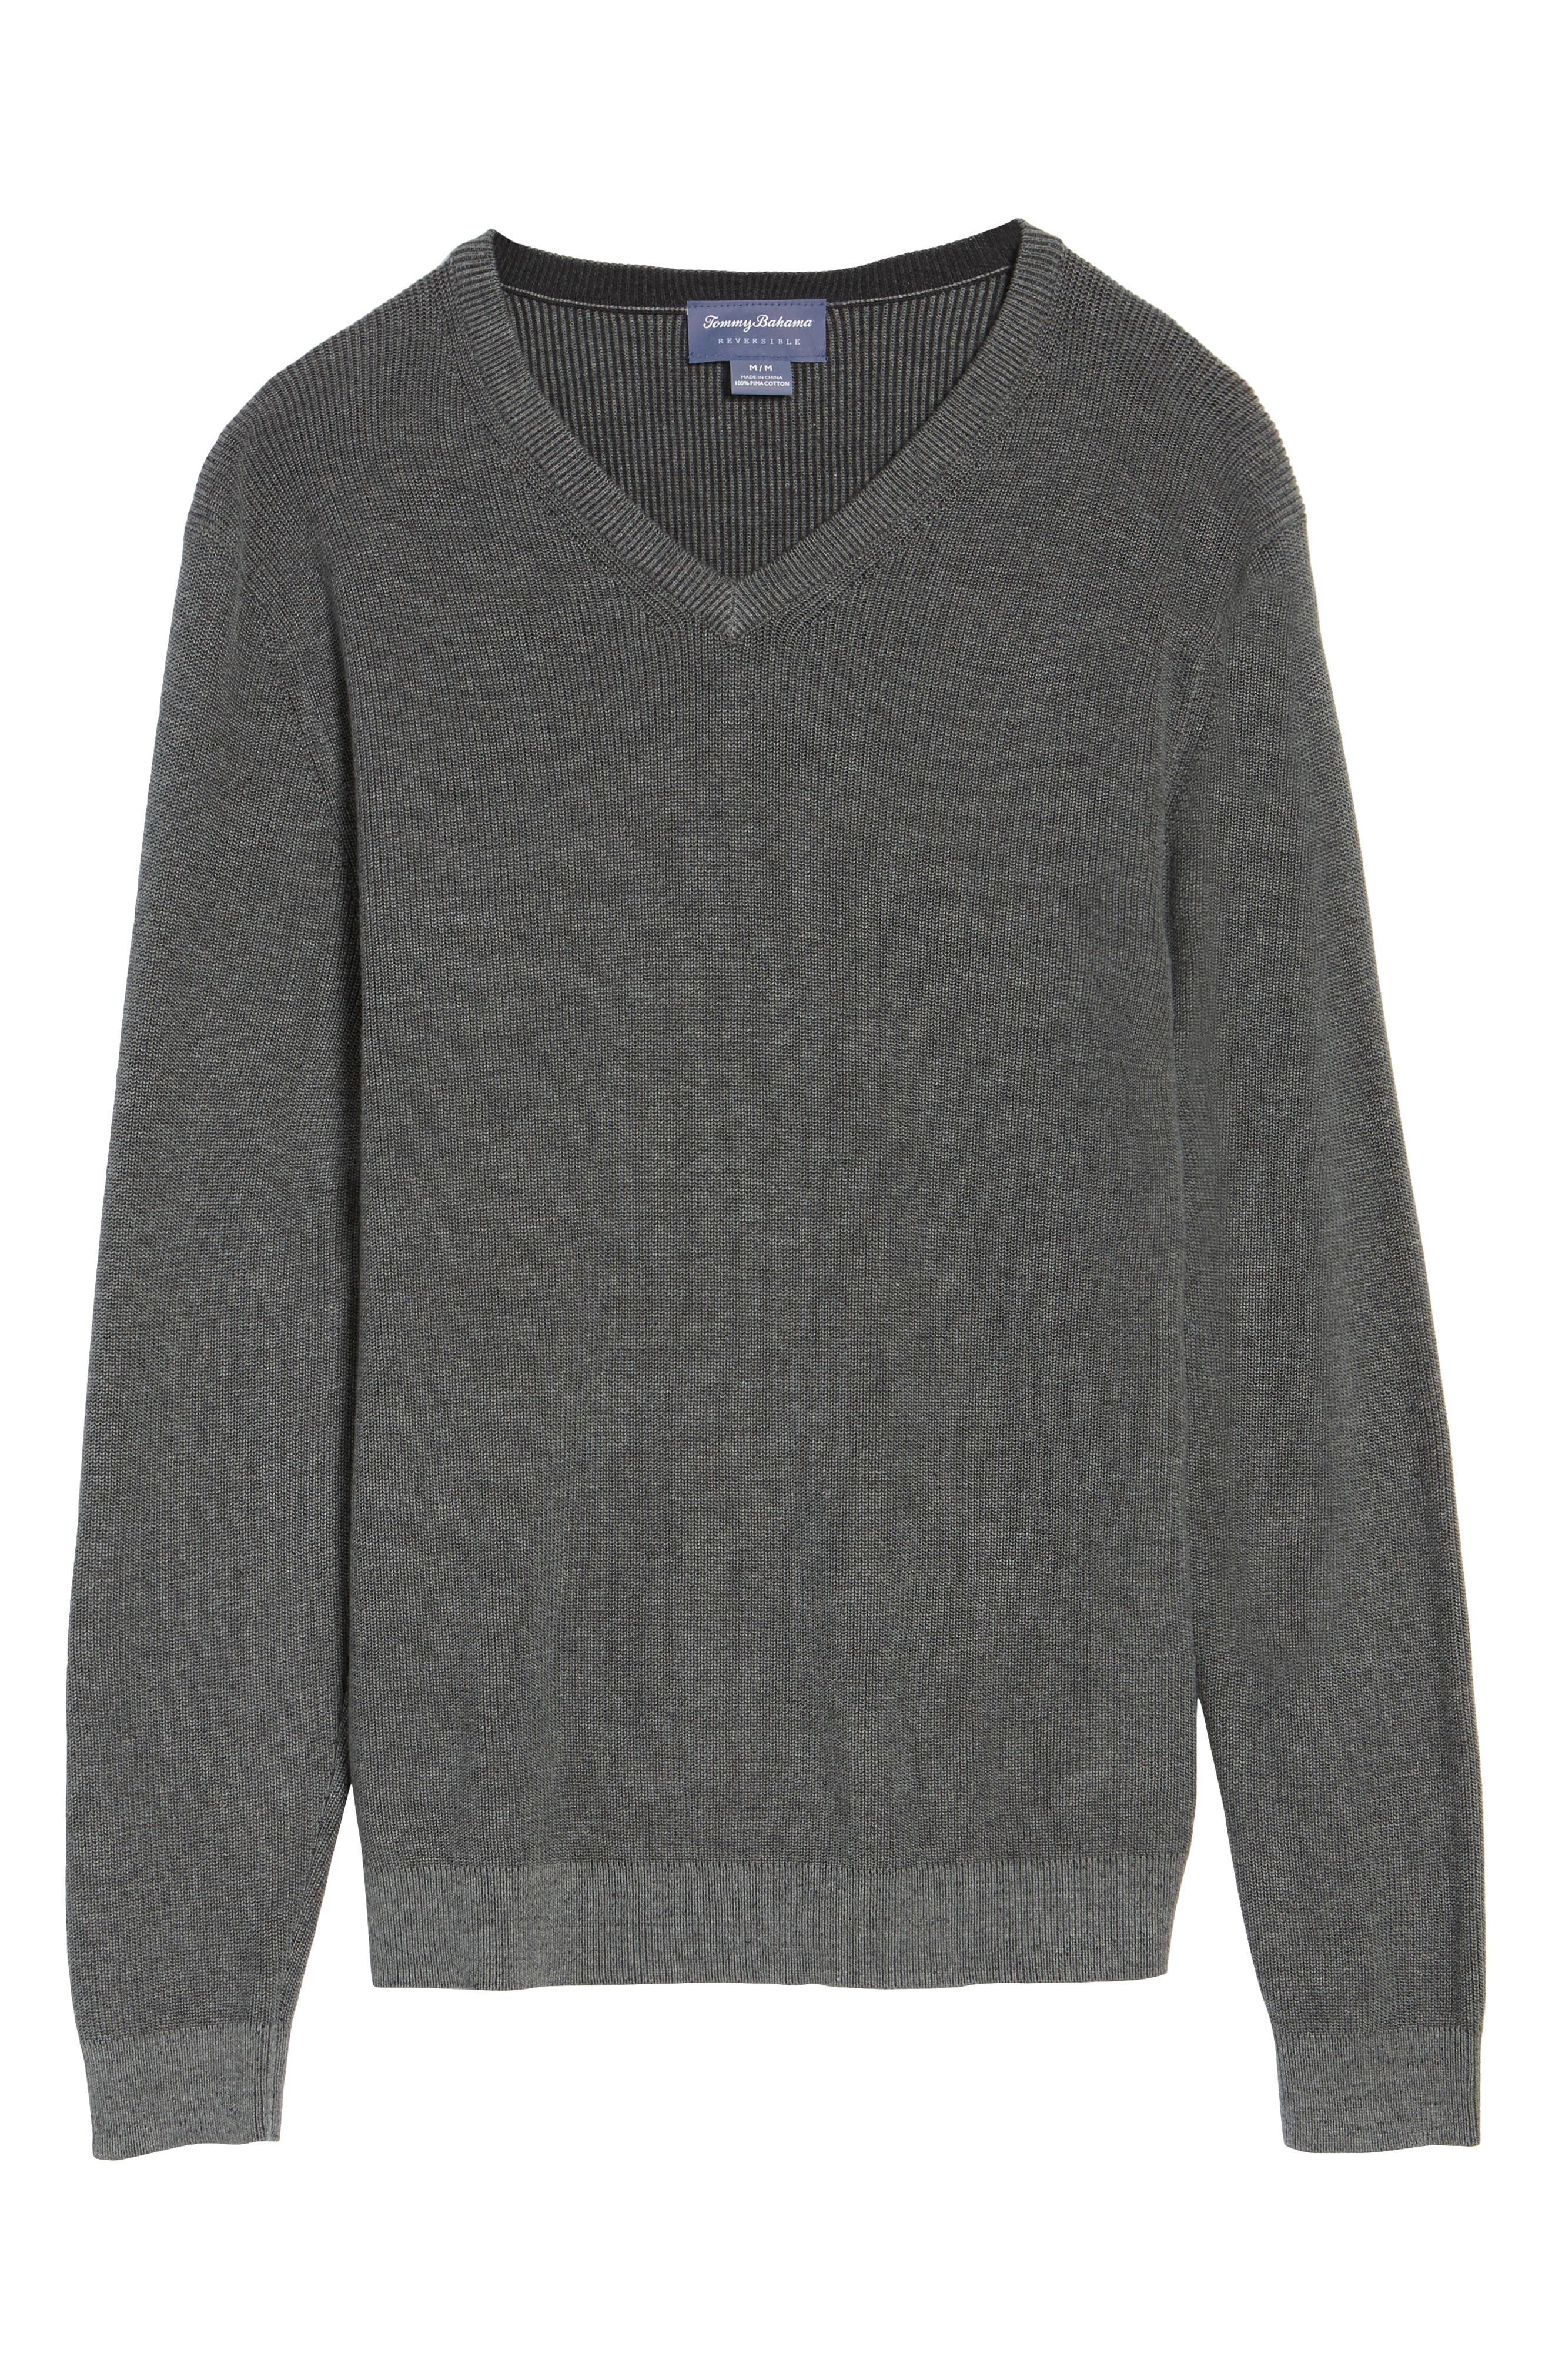 Las Palmas Reversible Sweater,                             Alternate thumbnail 5, color,                             Charcoal Heather